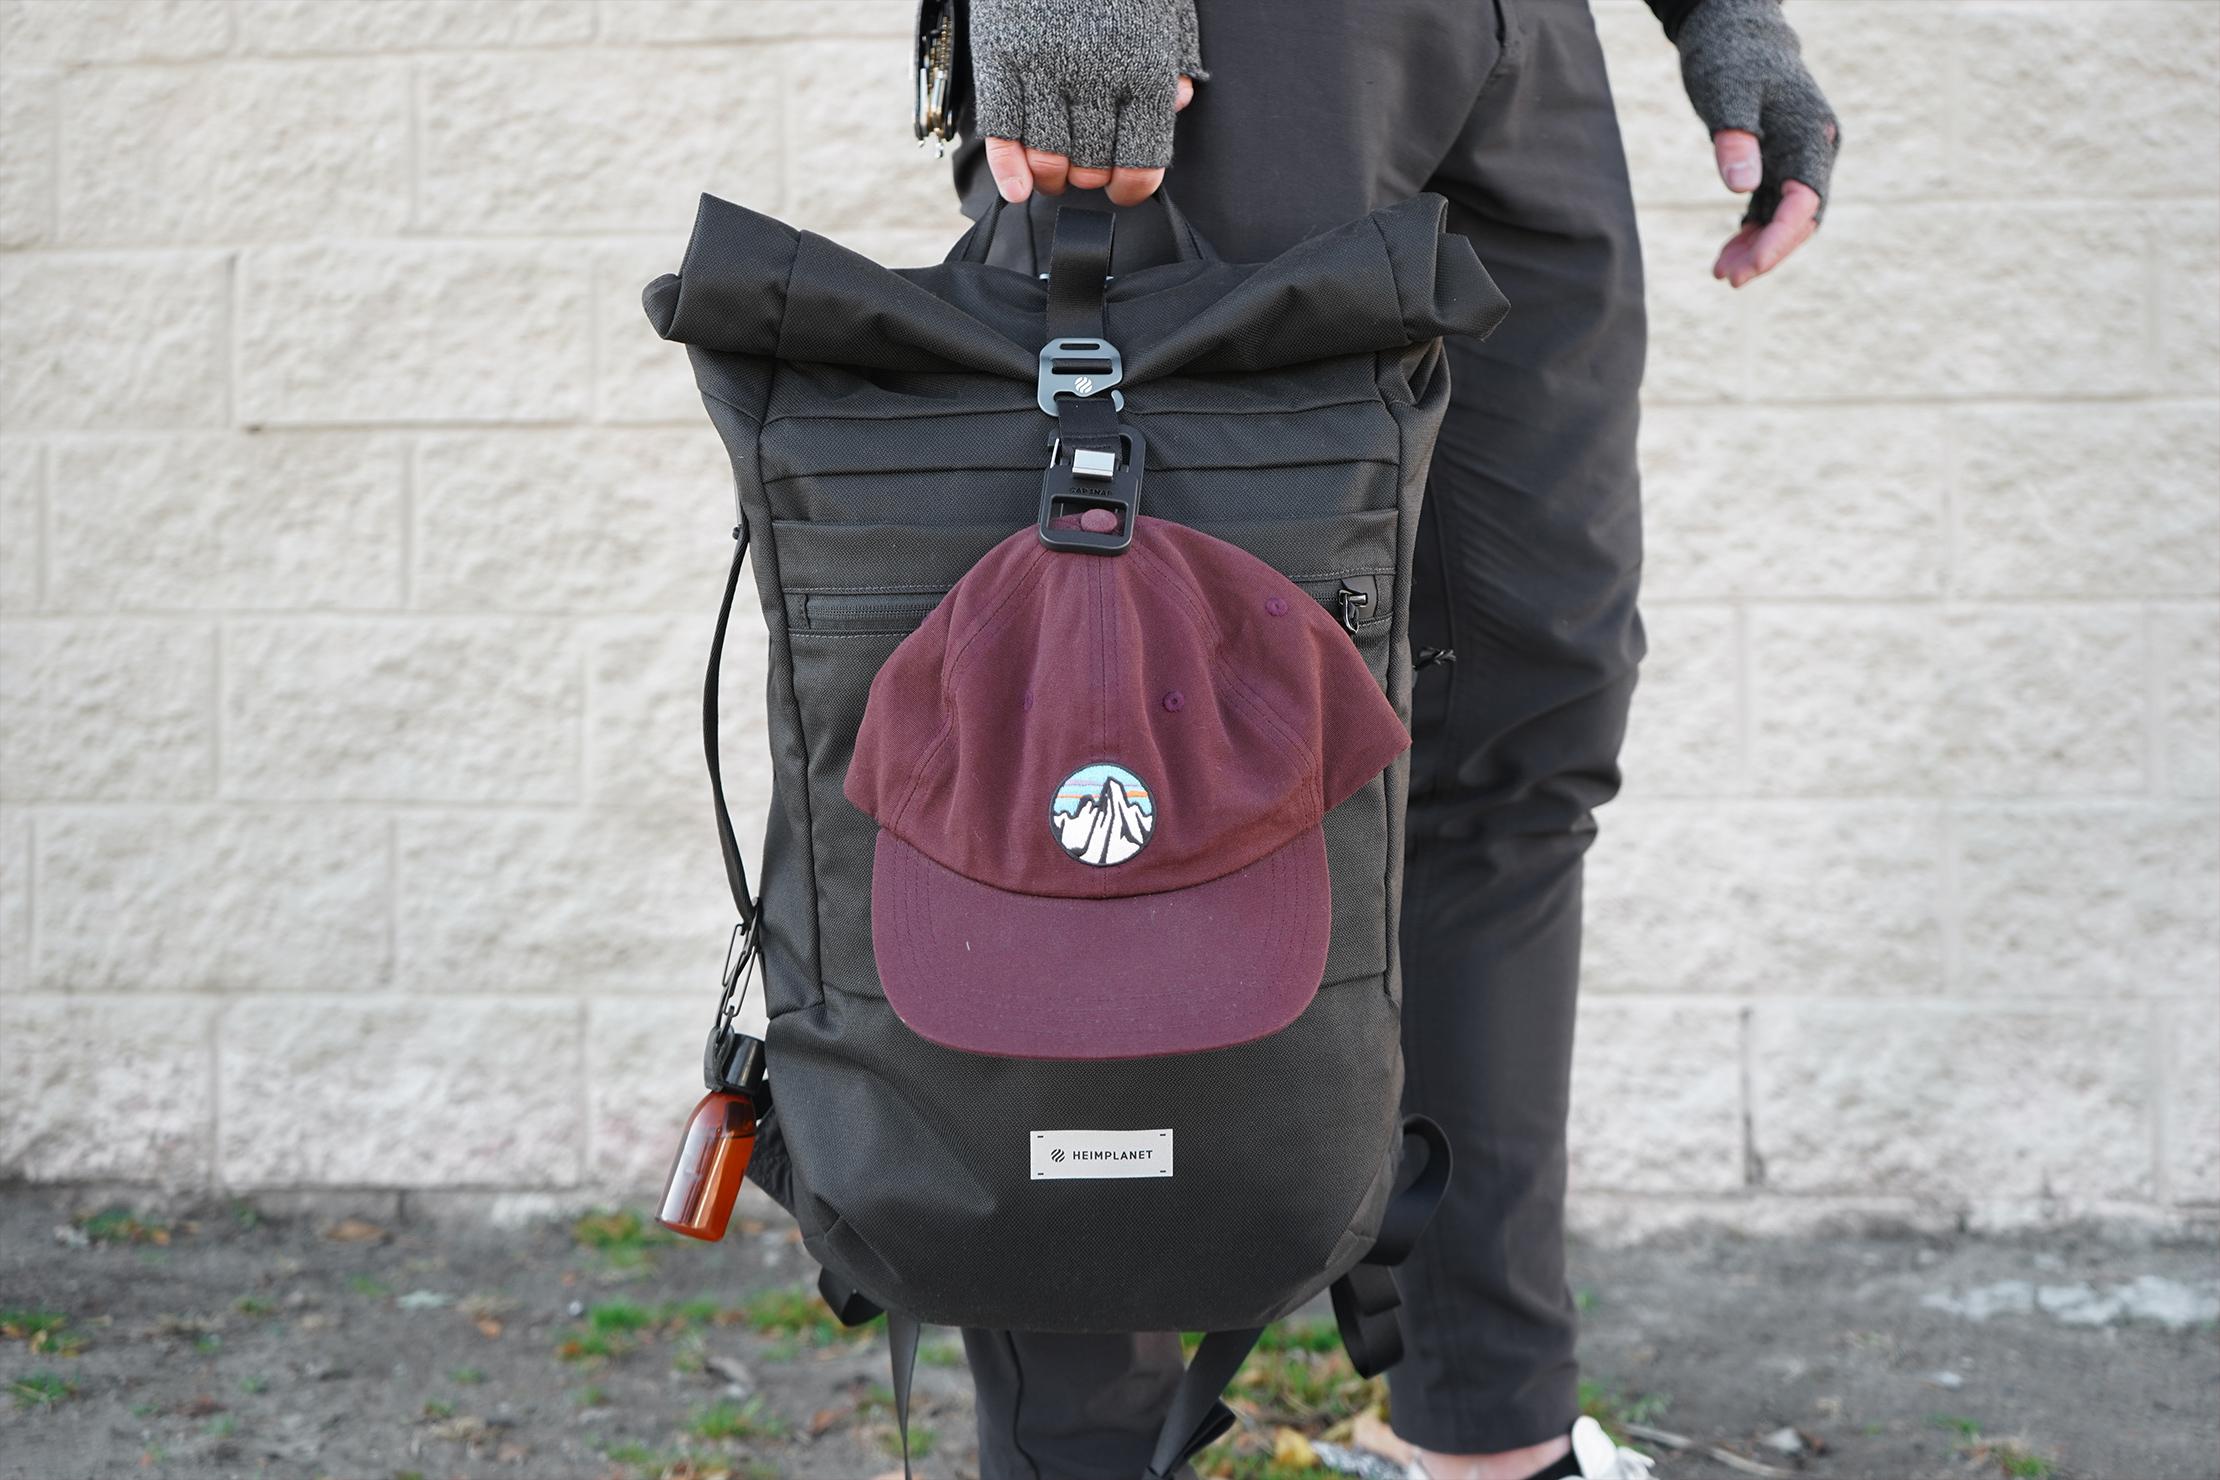 Heimplanet Commuter Pack Top Handle